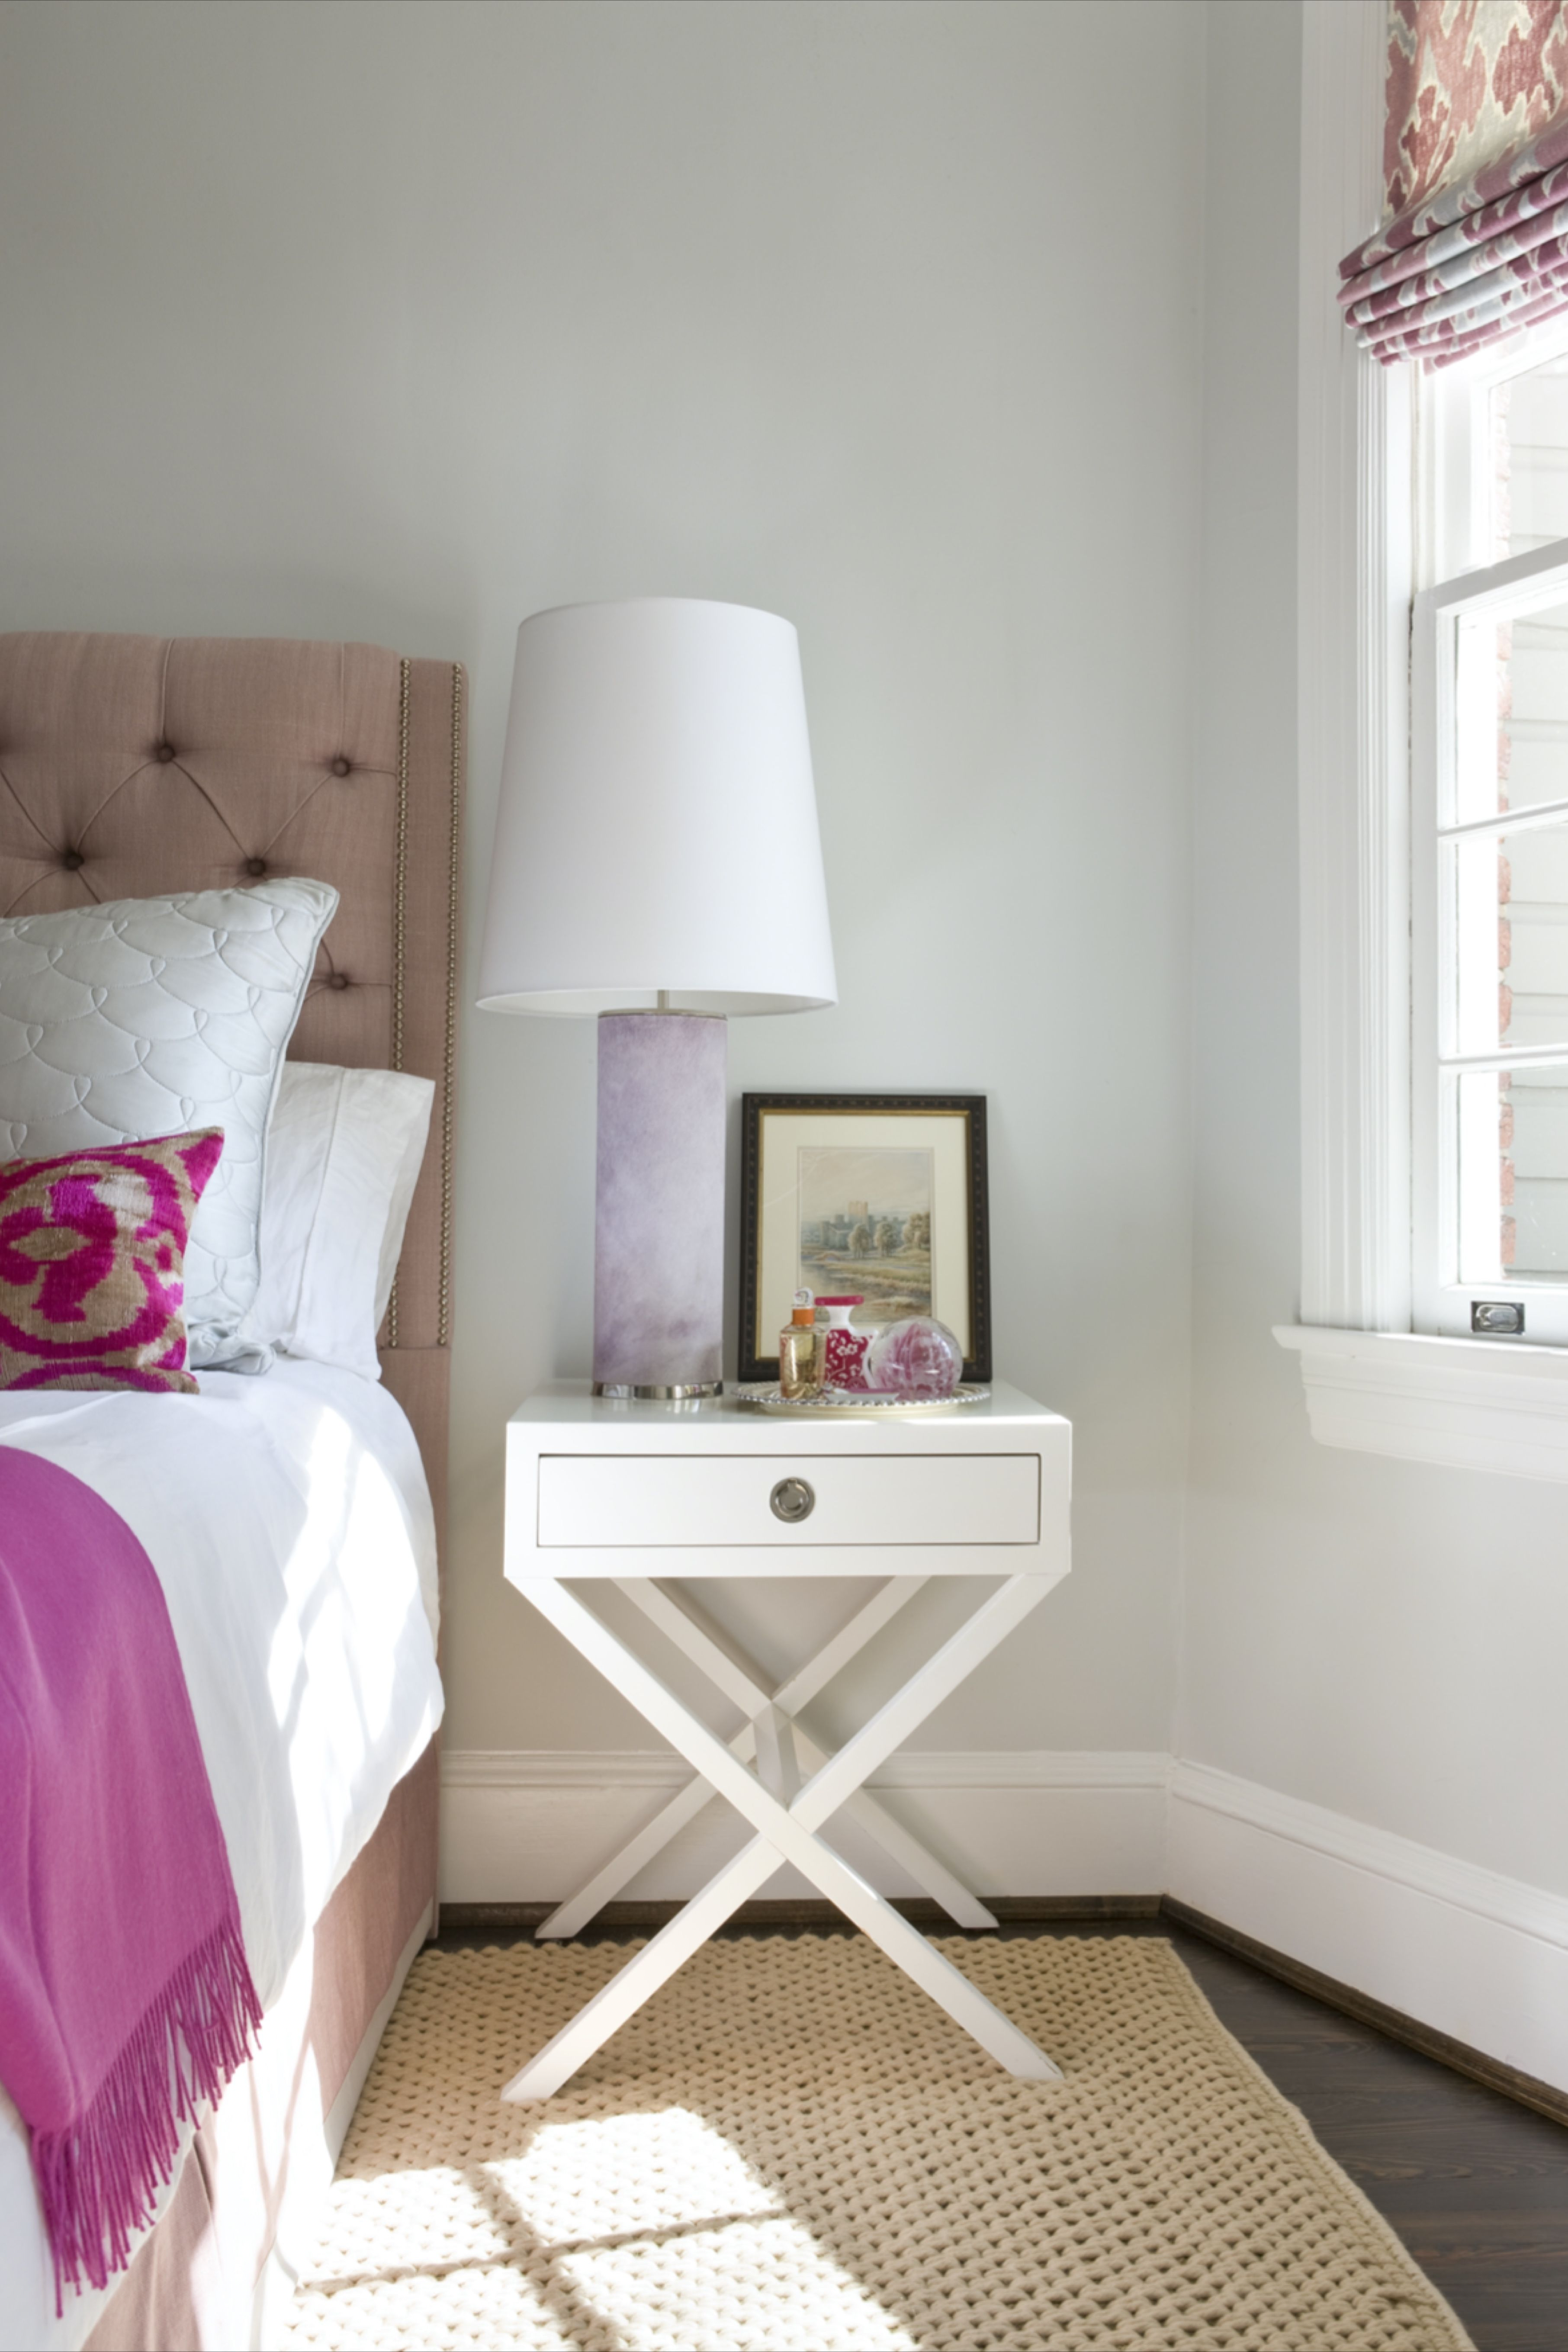 #ssiprojectrst #homeinterior #interiordesign #homedecor  photo: Angie Seckinger